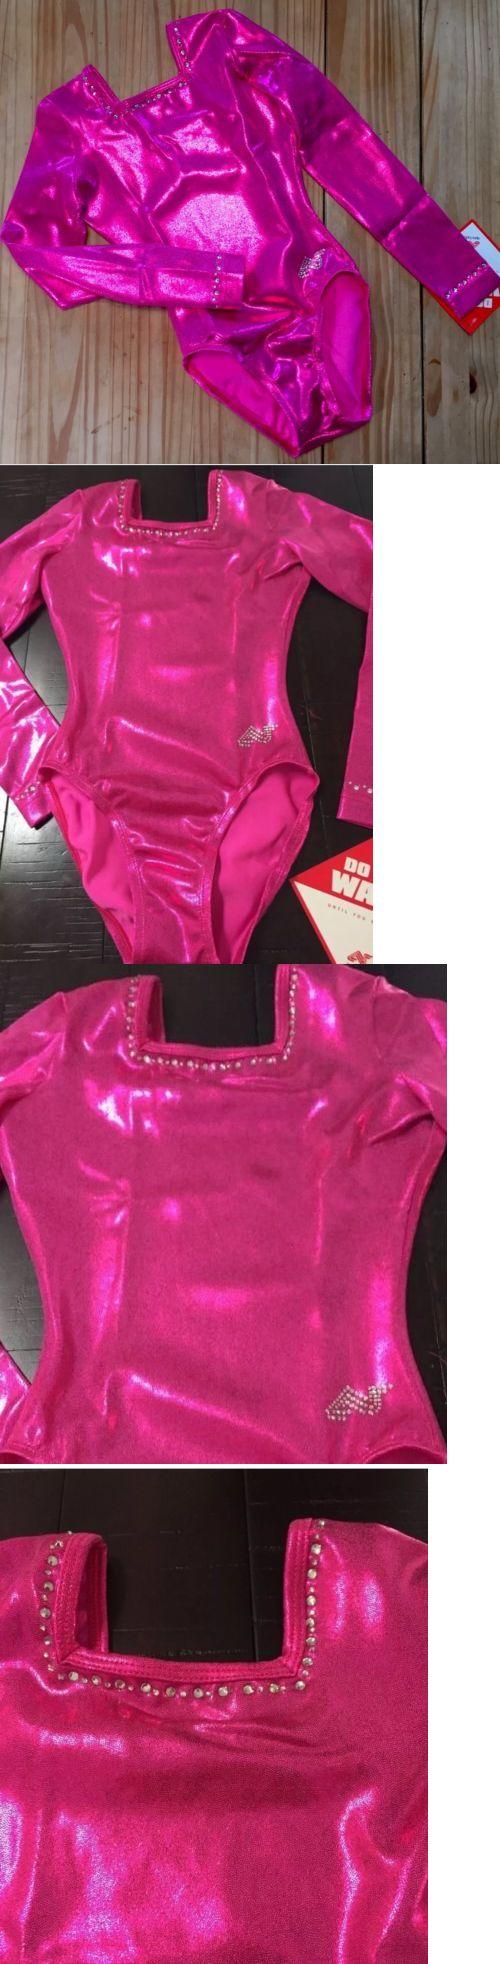 Women 159169: New Alpha Factor Ariels Gymnastics Pink Leotard Rhinestones Competition Sz: Cla BUY IT NOW ONLY: $68.5